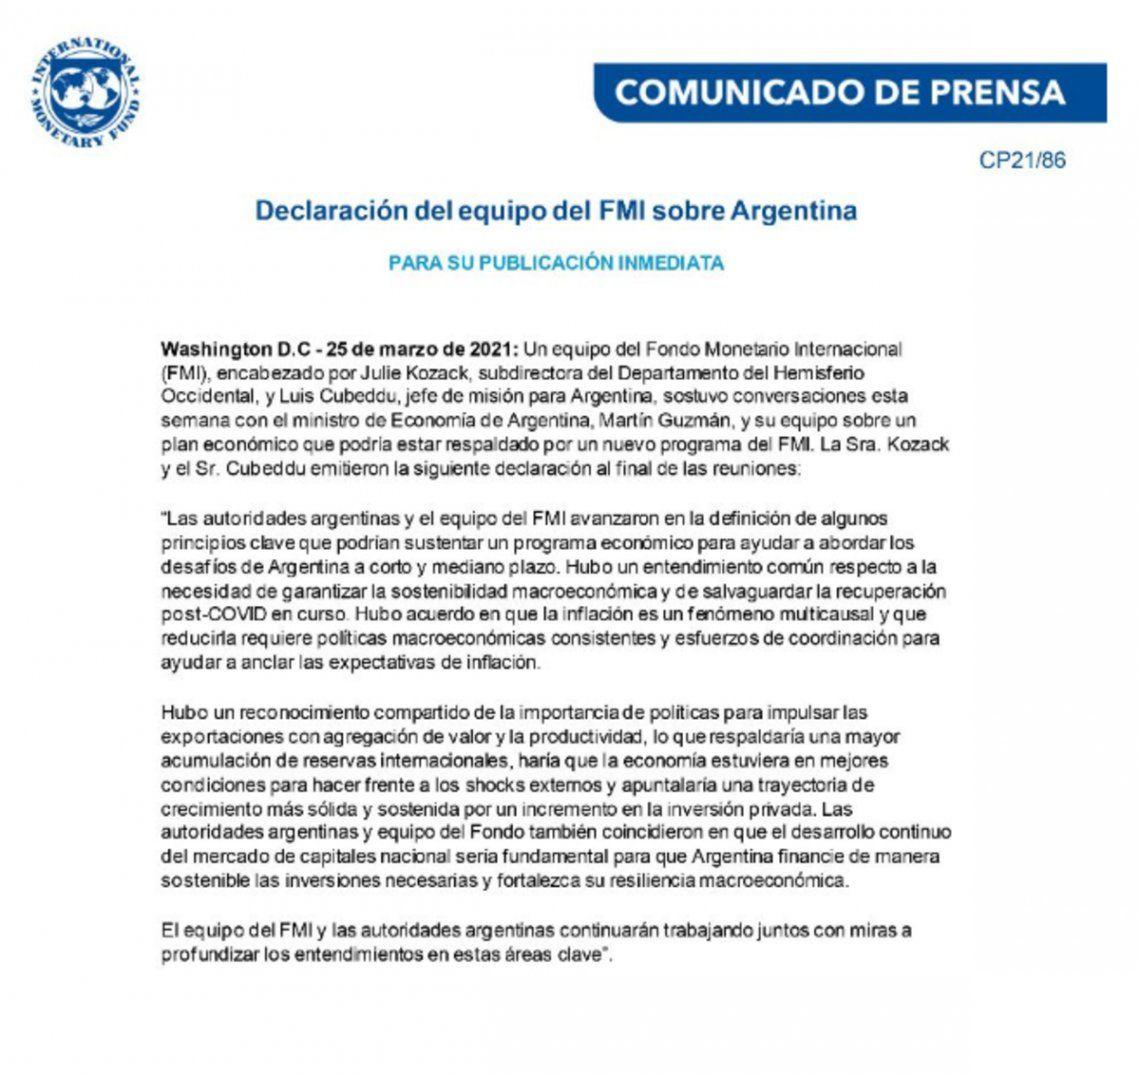 El comunicado del FMI